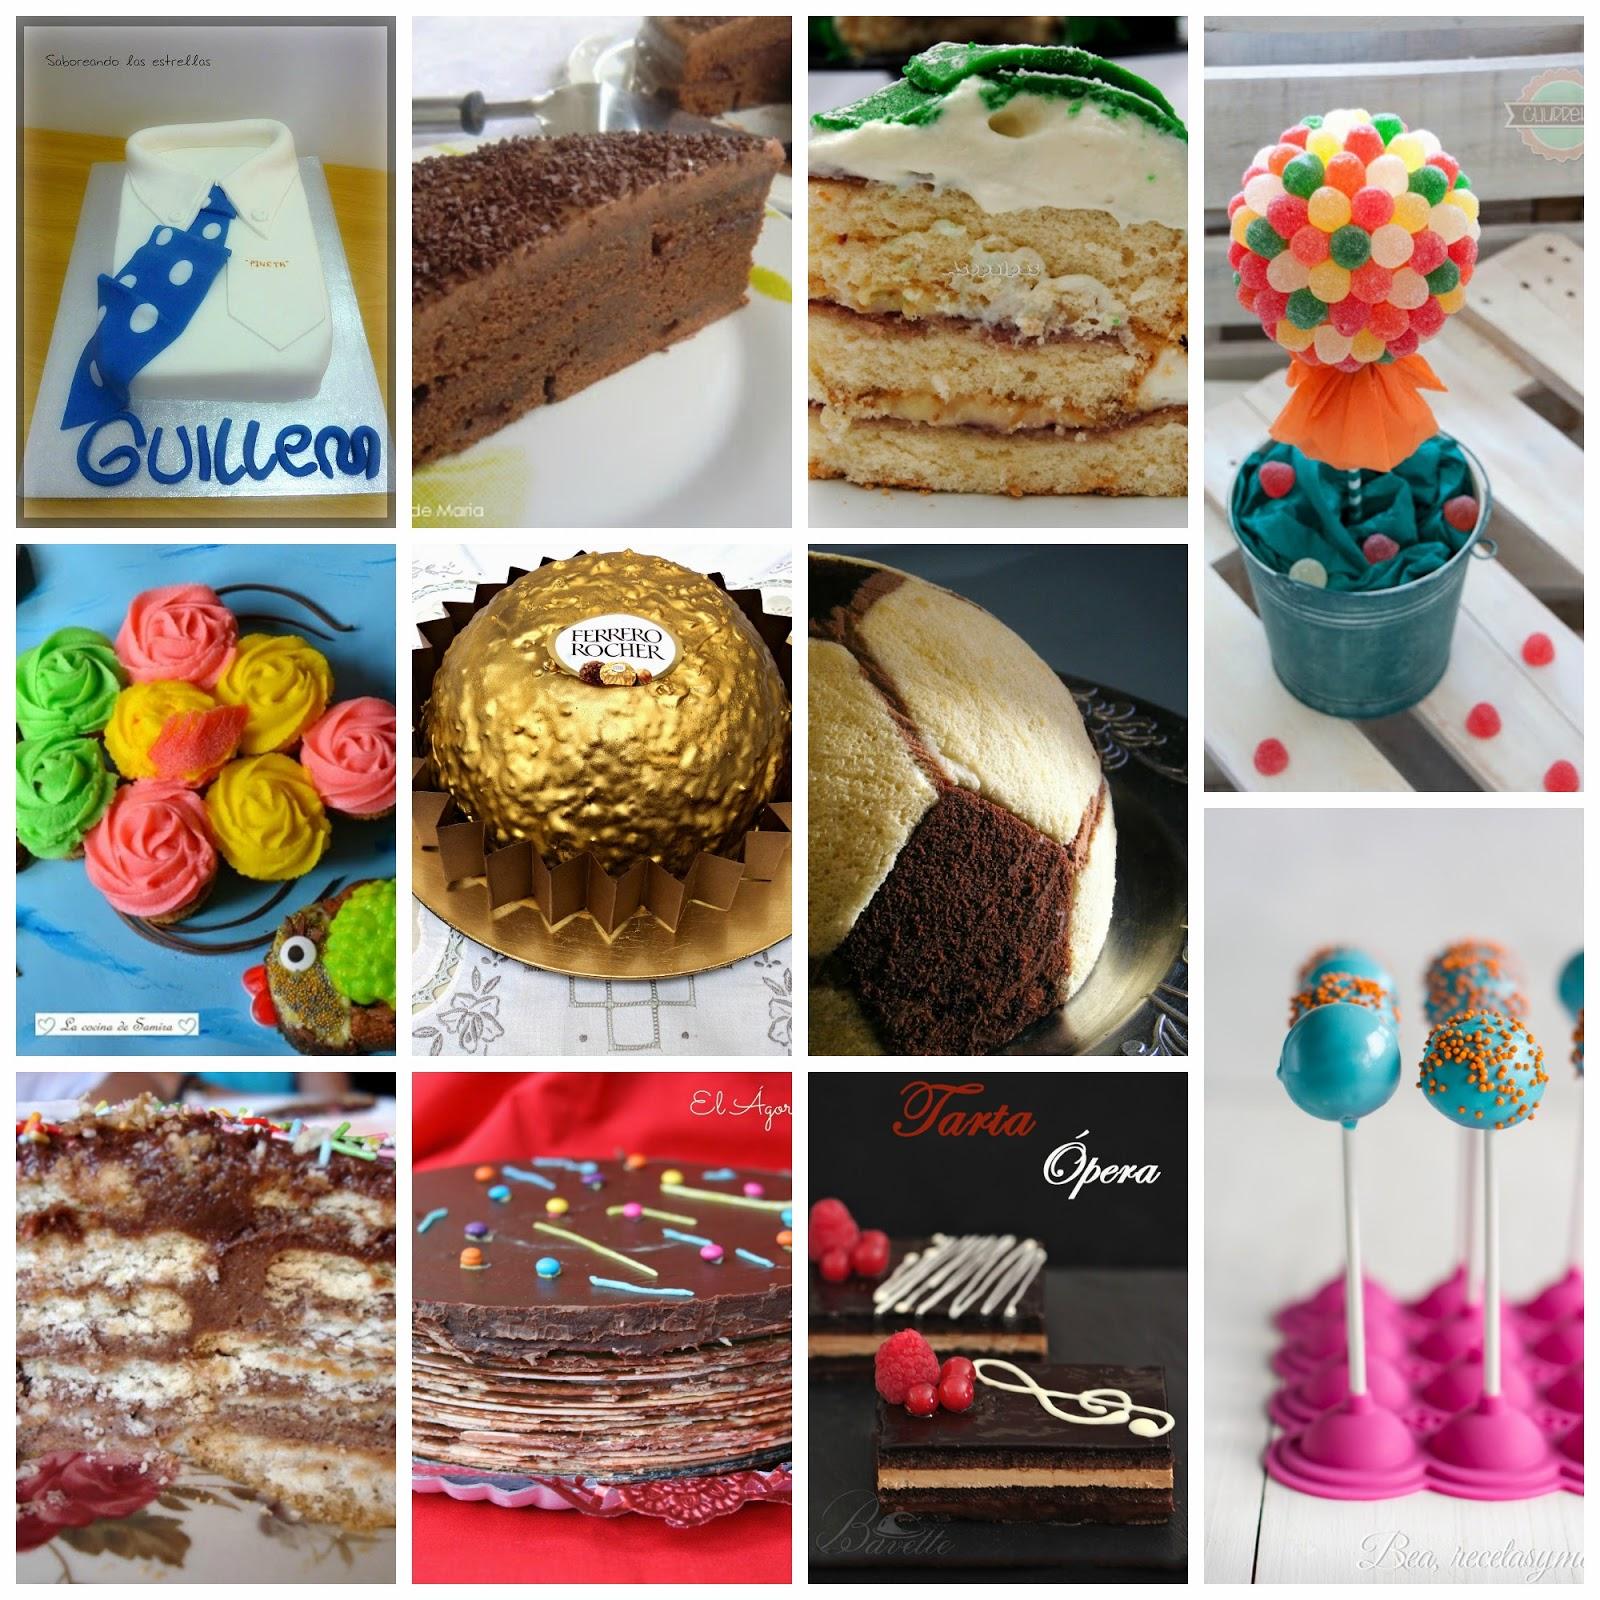 11 pasteles para una fiesta de cumplea os infantil - Comidas para cumpleanos en casa ...